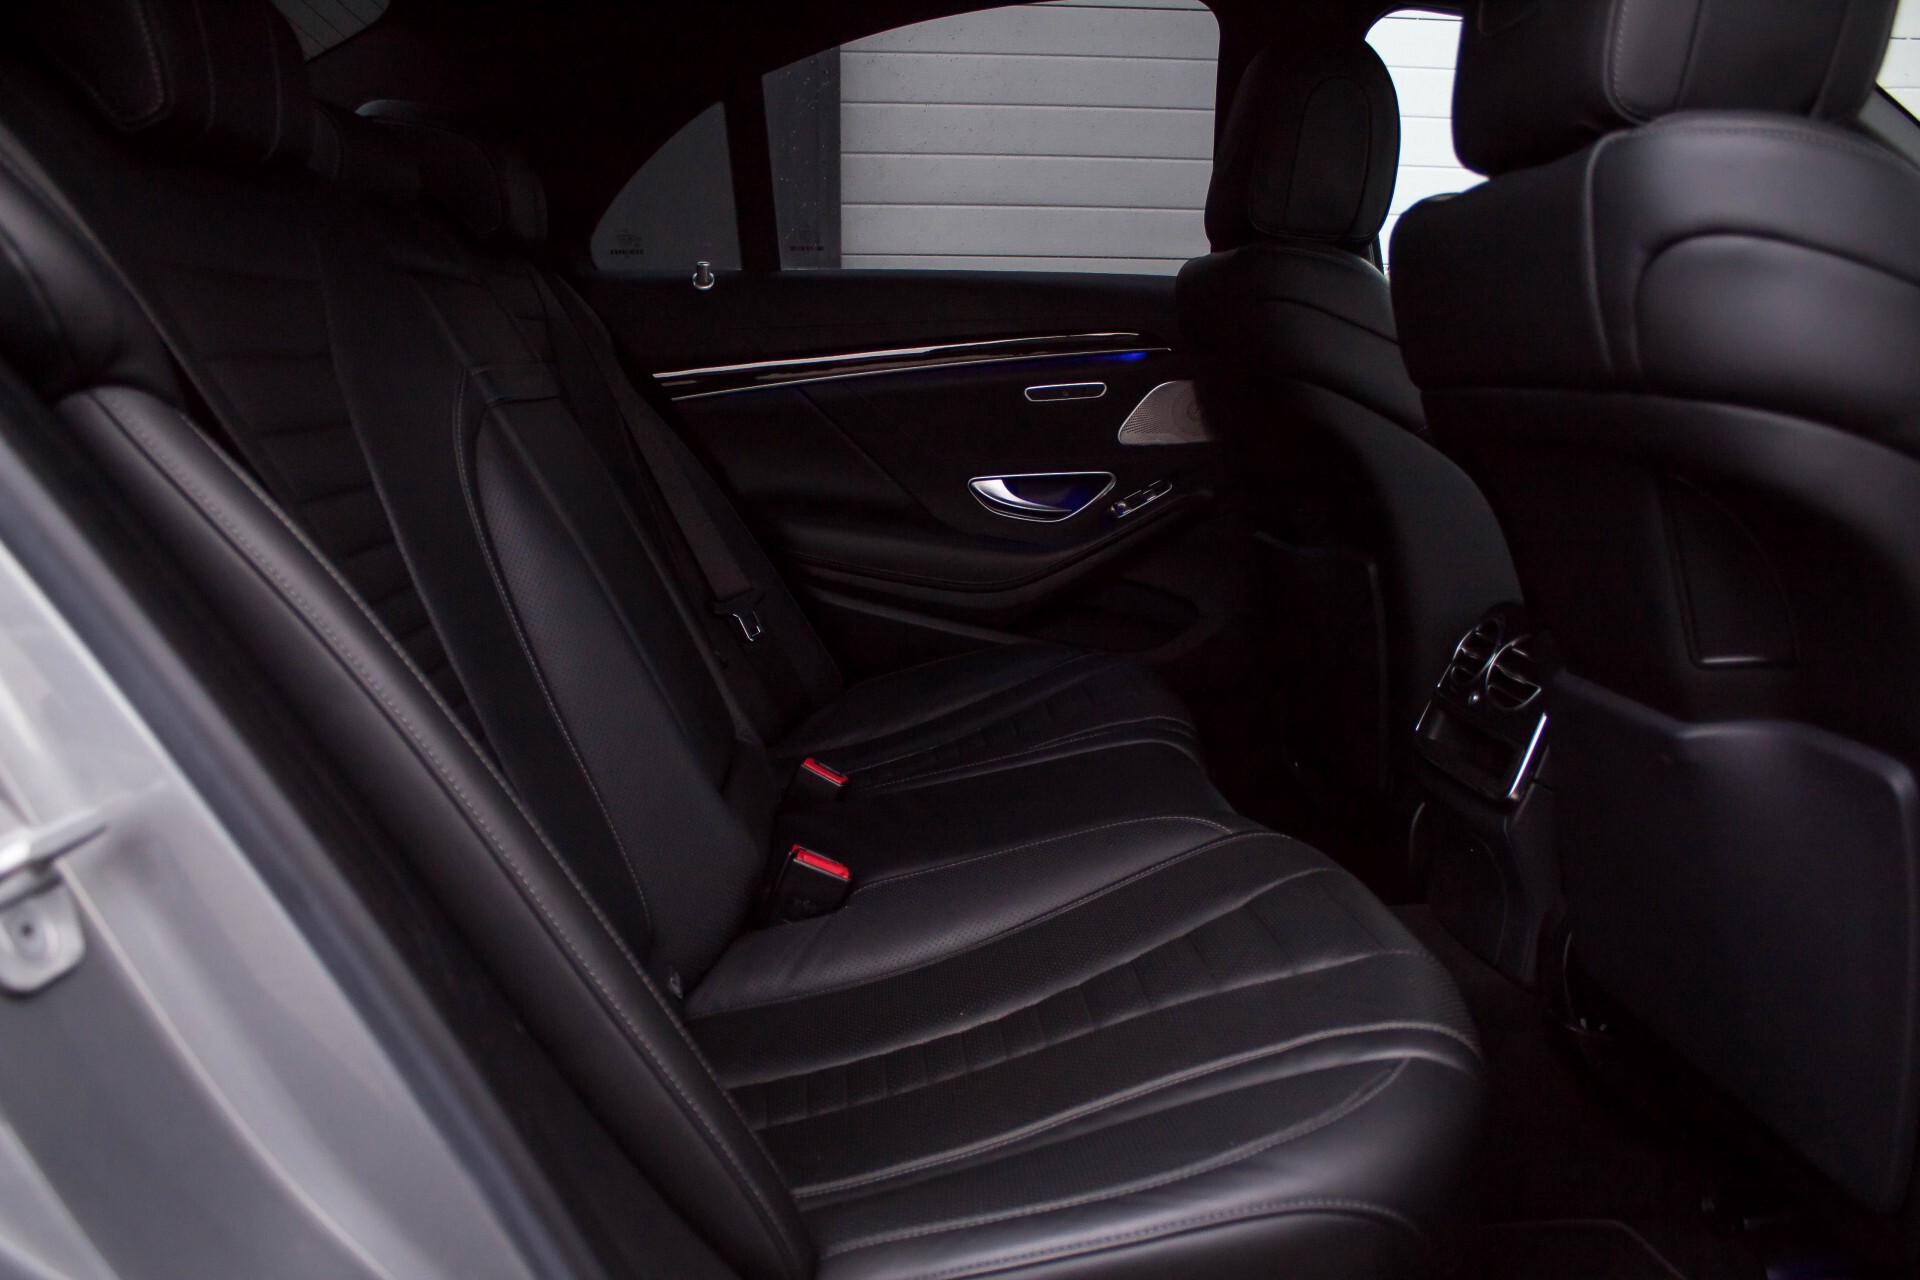 Mercedes-Benz S-Klasse 350 BlueTEC 63 AMG Panorama/Distronic/Keyless/Massage/Burmester Aut7 Foto 4